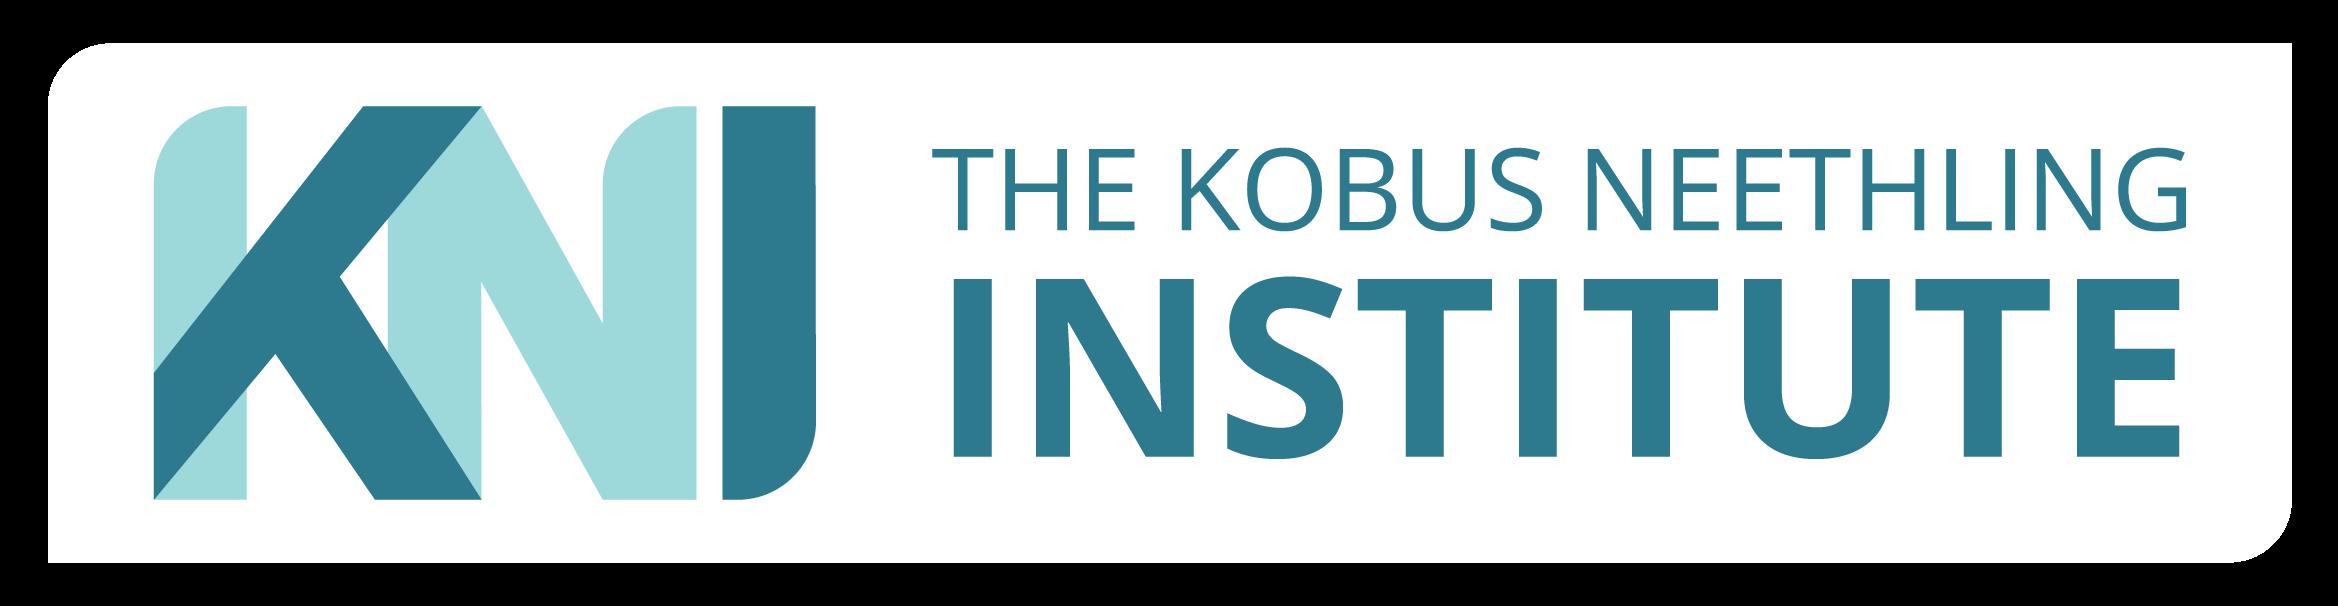 The Kobus Neethling Institute Logo